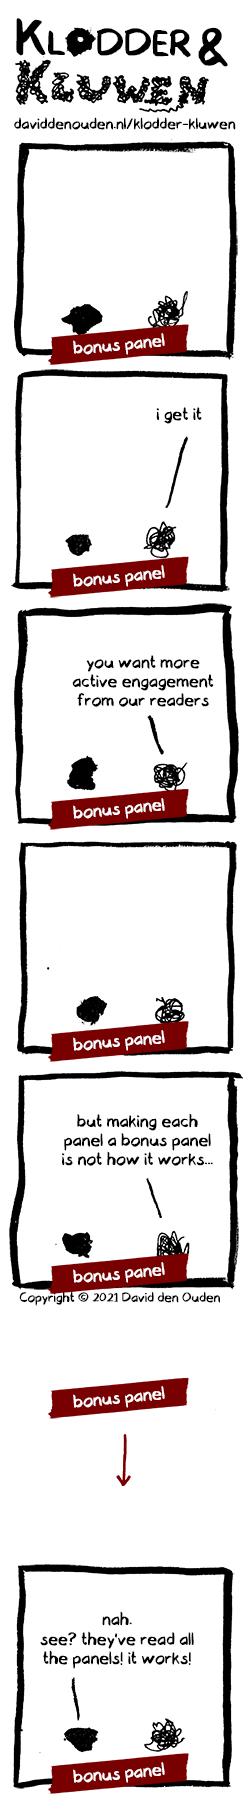 1. 'BONUS PANEL'  2. Kluwen: 'i get it' 'BONUS PANEL'  3. Kluwen: 'you want more active engagement from our readers' 'BONUS PANEL'  4. 'BONUS PANEL'  5. Kluwen: 'but making each panel a bonus panel is not how it works...'  'BONUS PANEL'  6. (blank with arrow) 'BONUS PANEL' 7. Klodder: 'nah. see? they've read all the panels! it works!' 'BONUS PANEL'